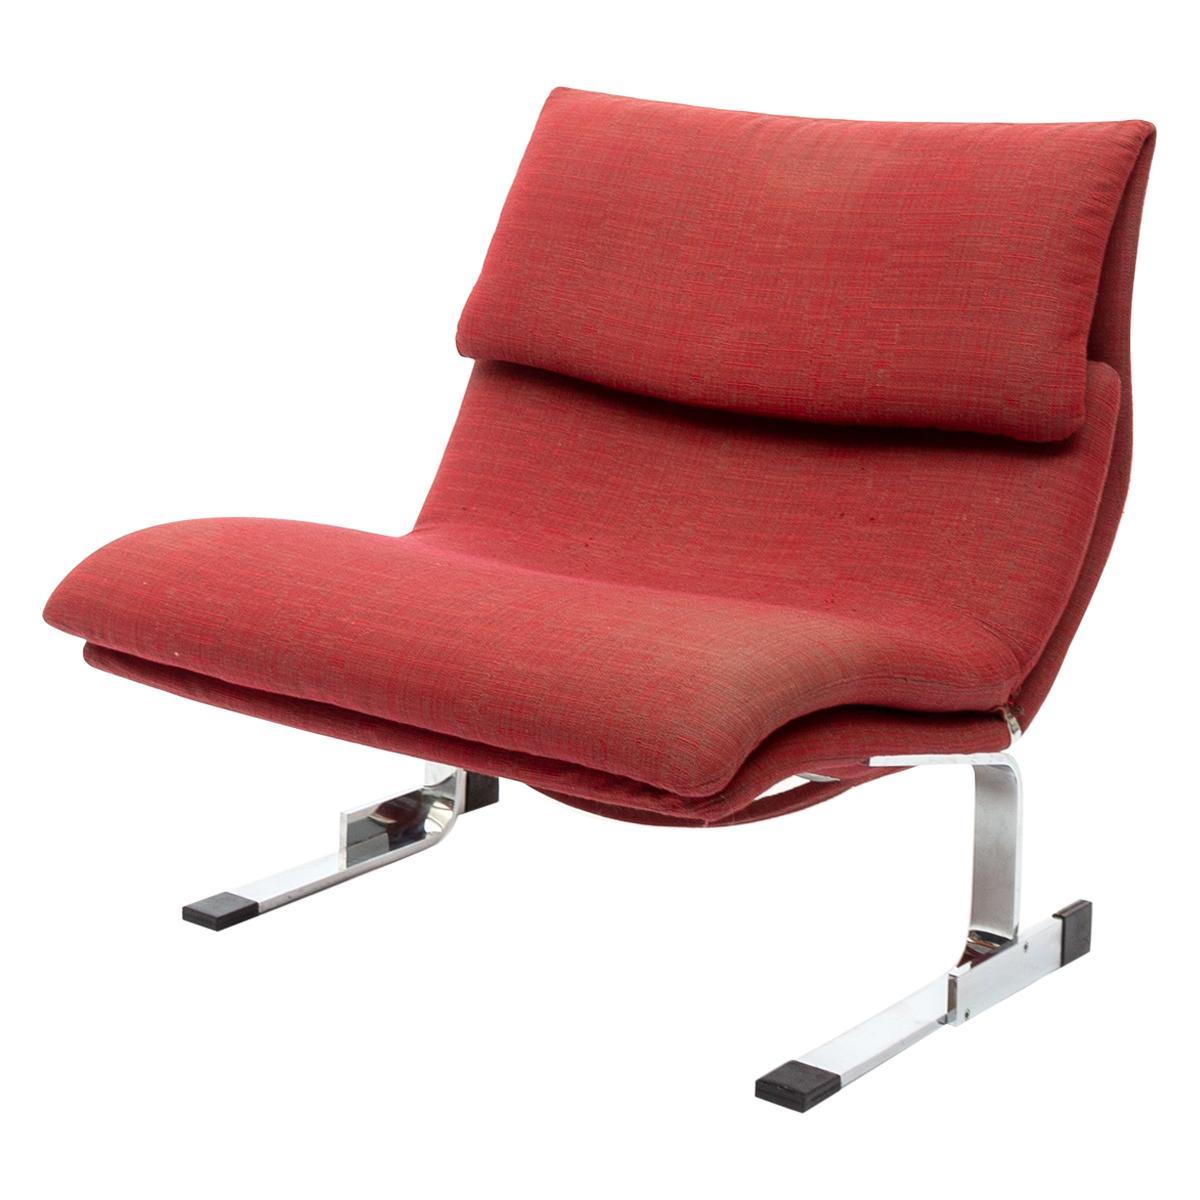 "Giovanni Offredi ""Onda"" Postmodern Wave Lounge Chair for Saporiti, 1970s"